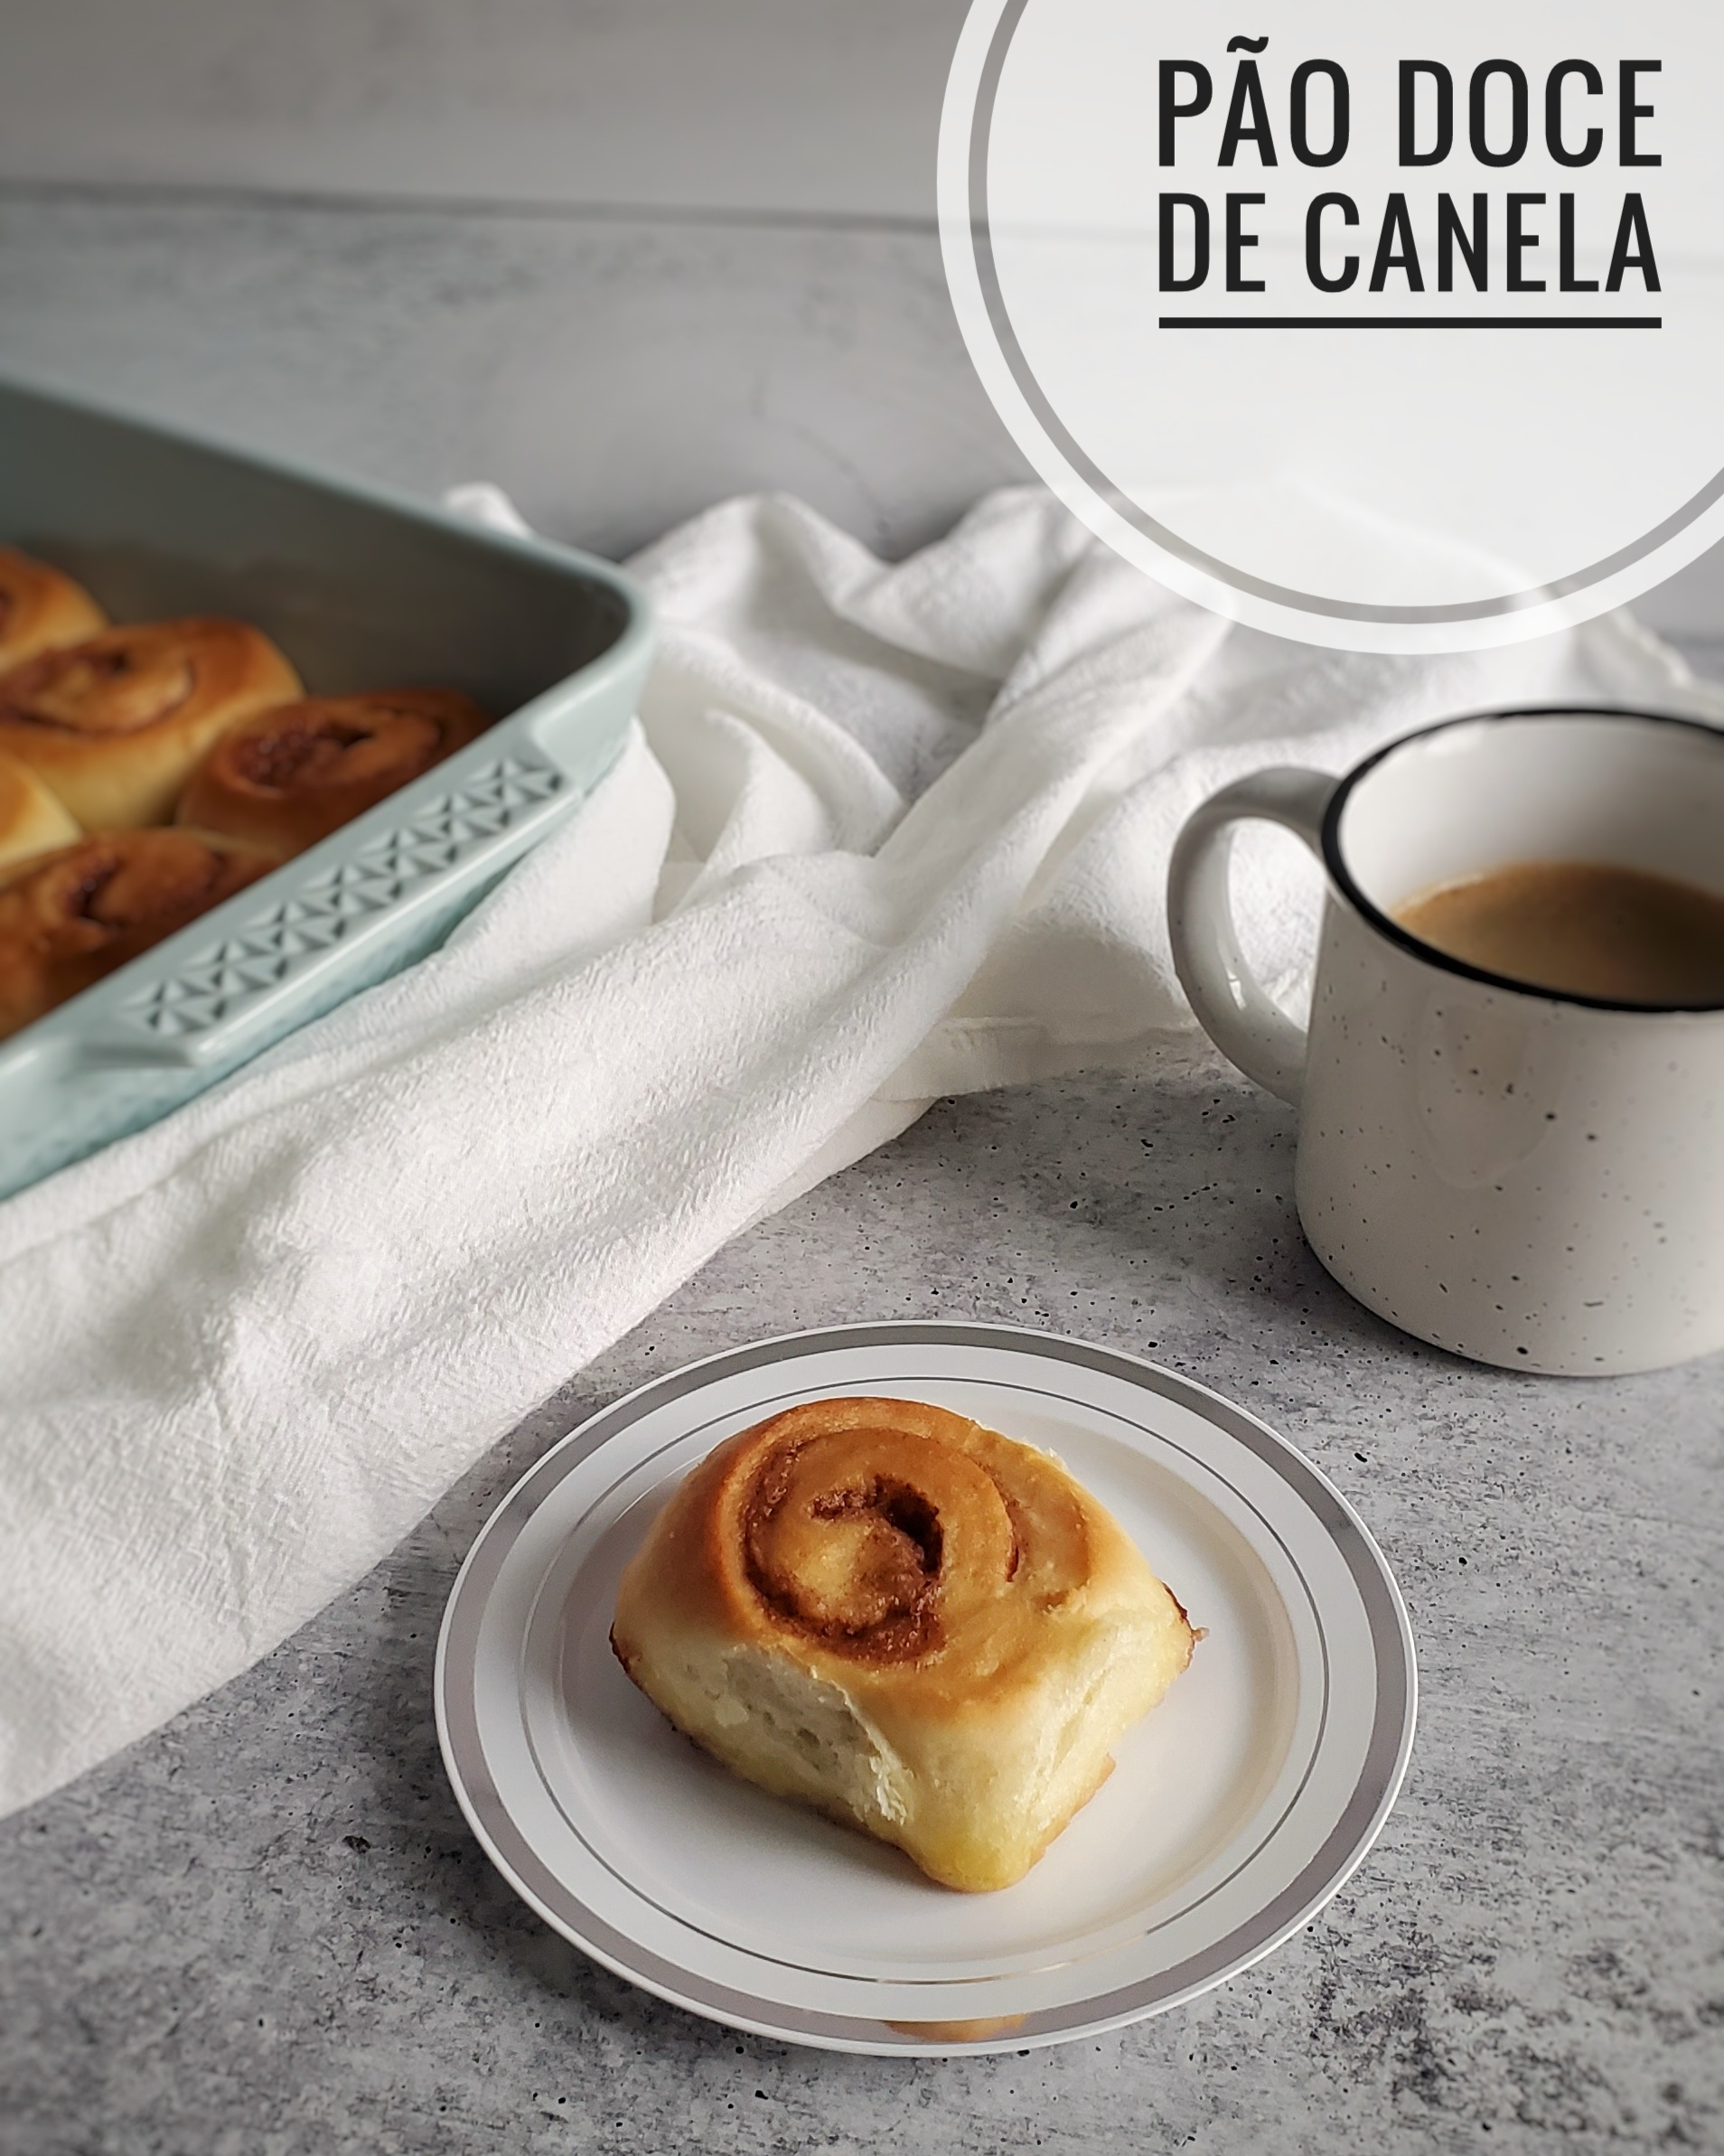 Pão Doce de Canela (Cinnamon Rolls)